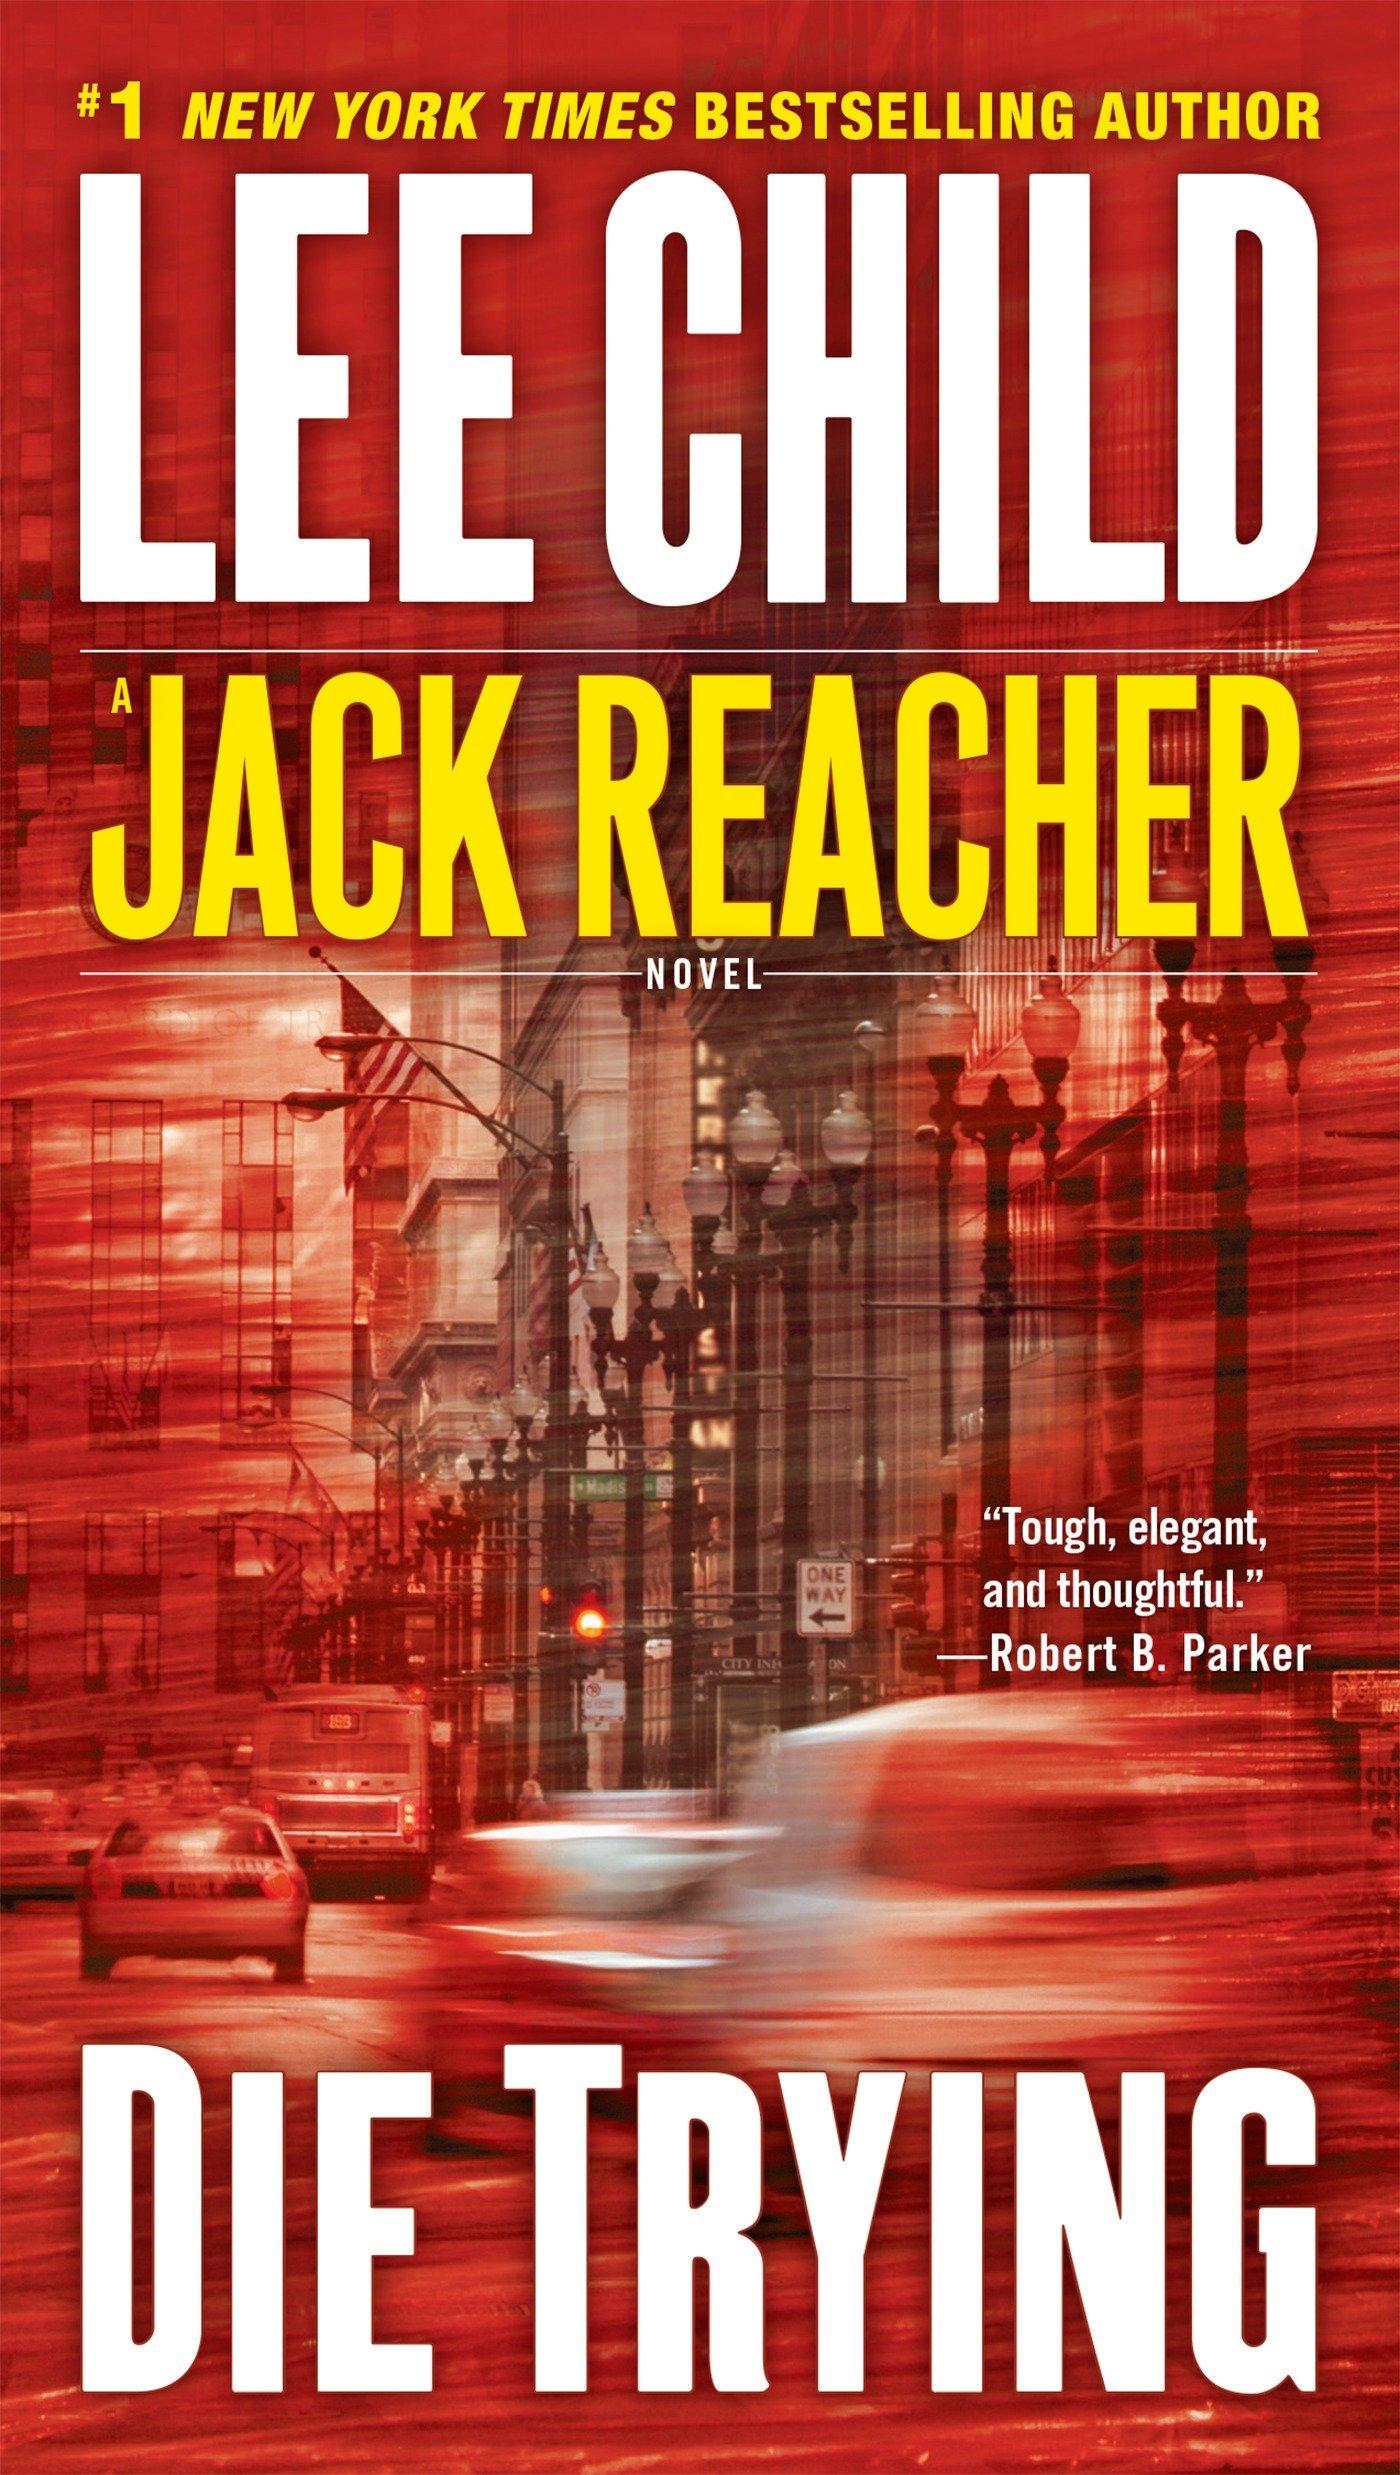 Jack Reacher books in order